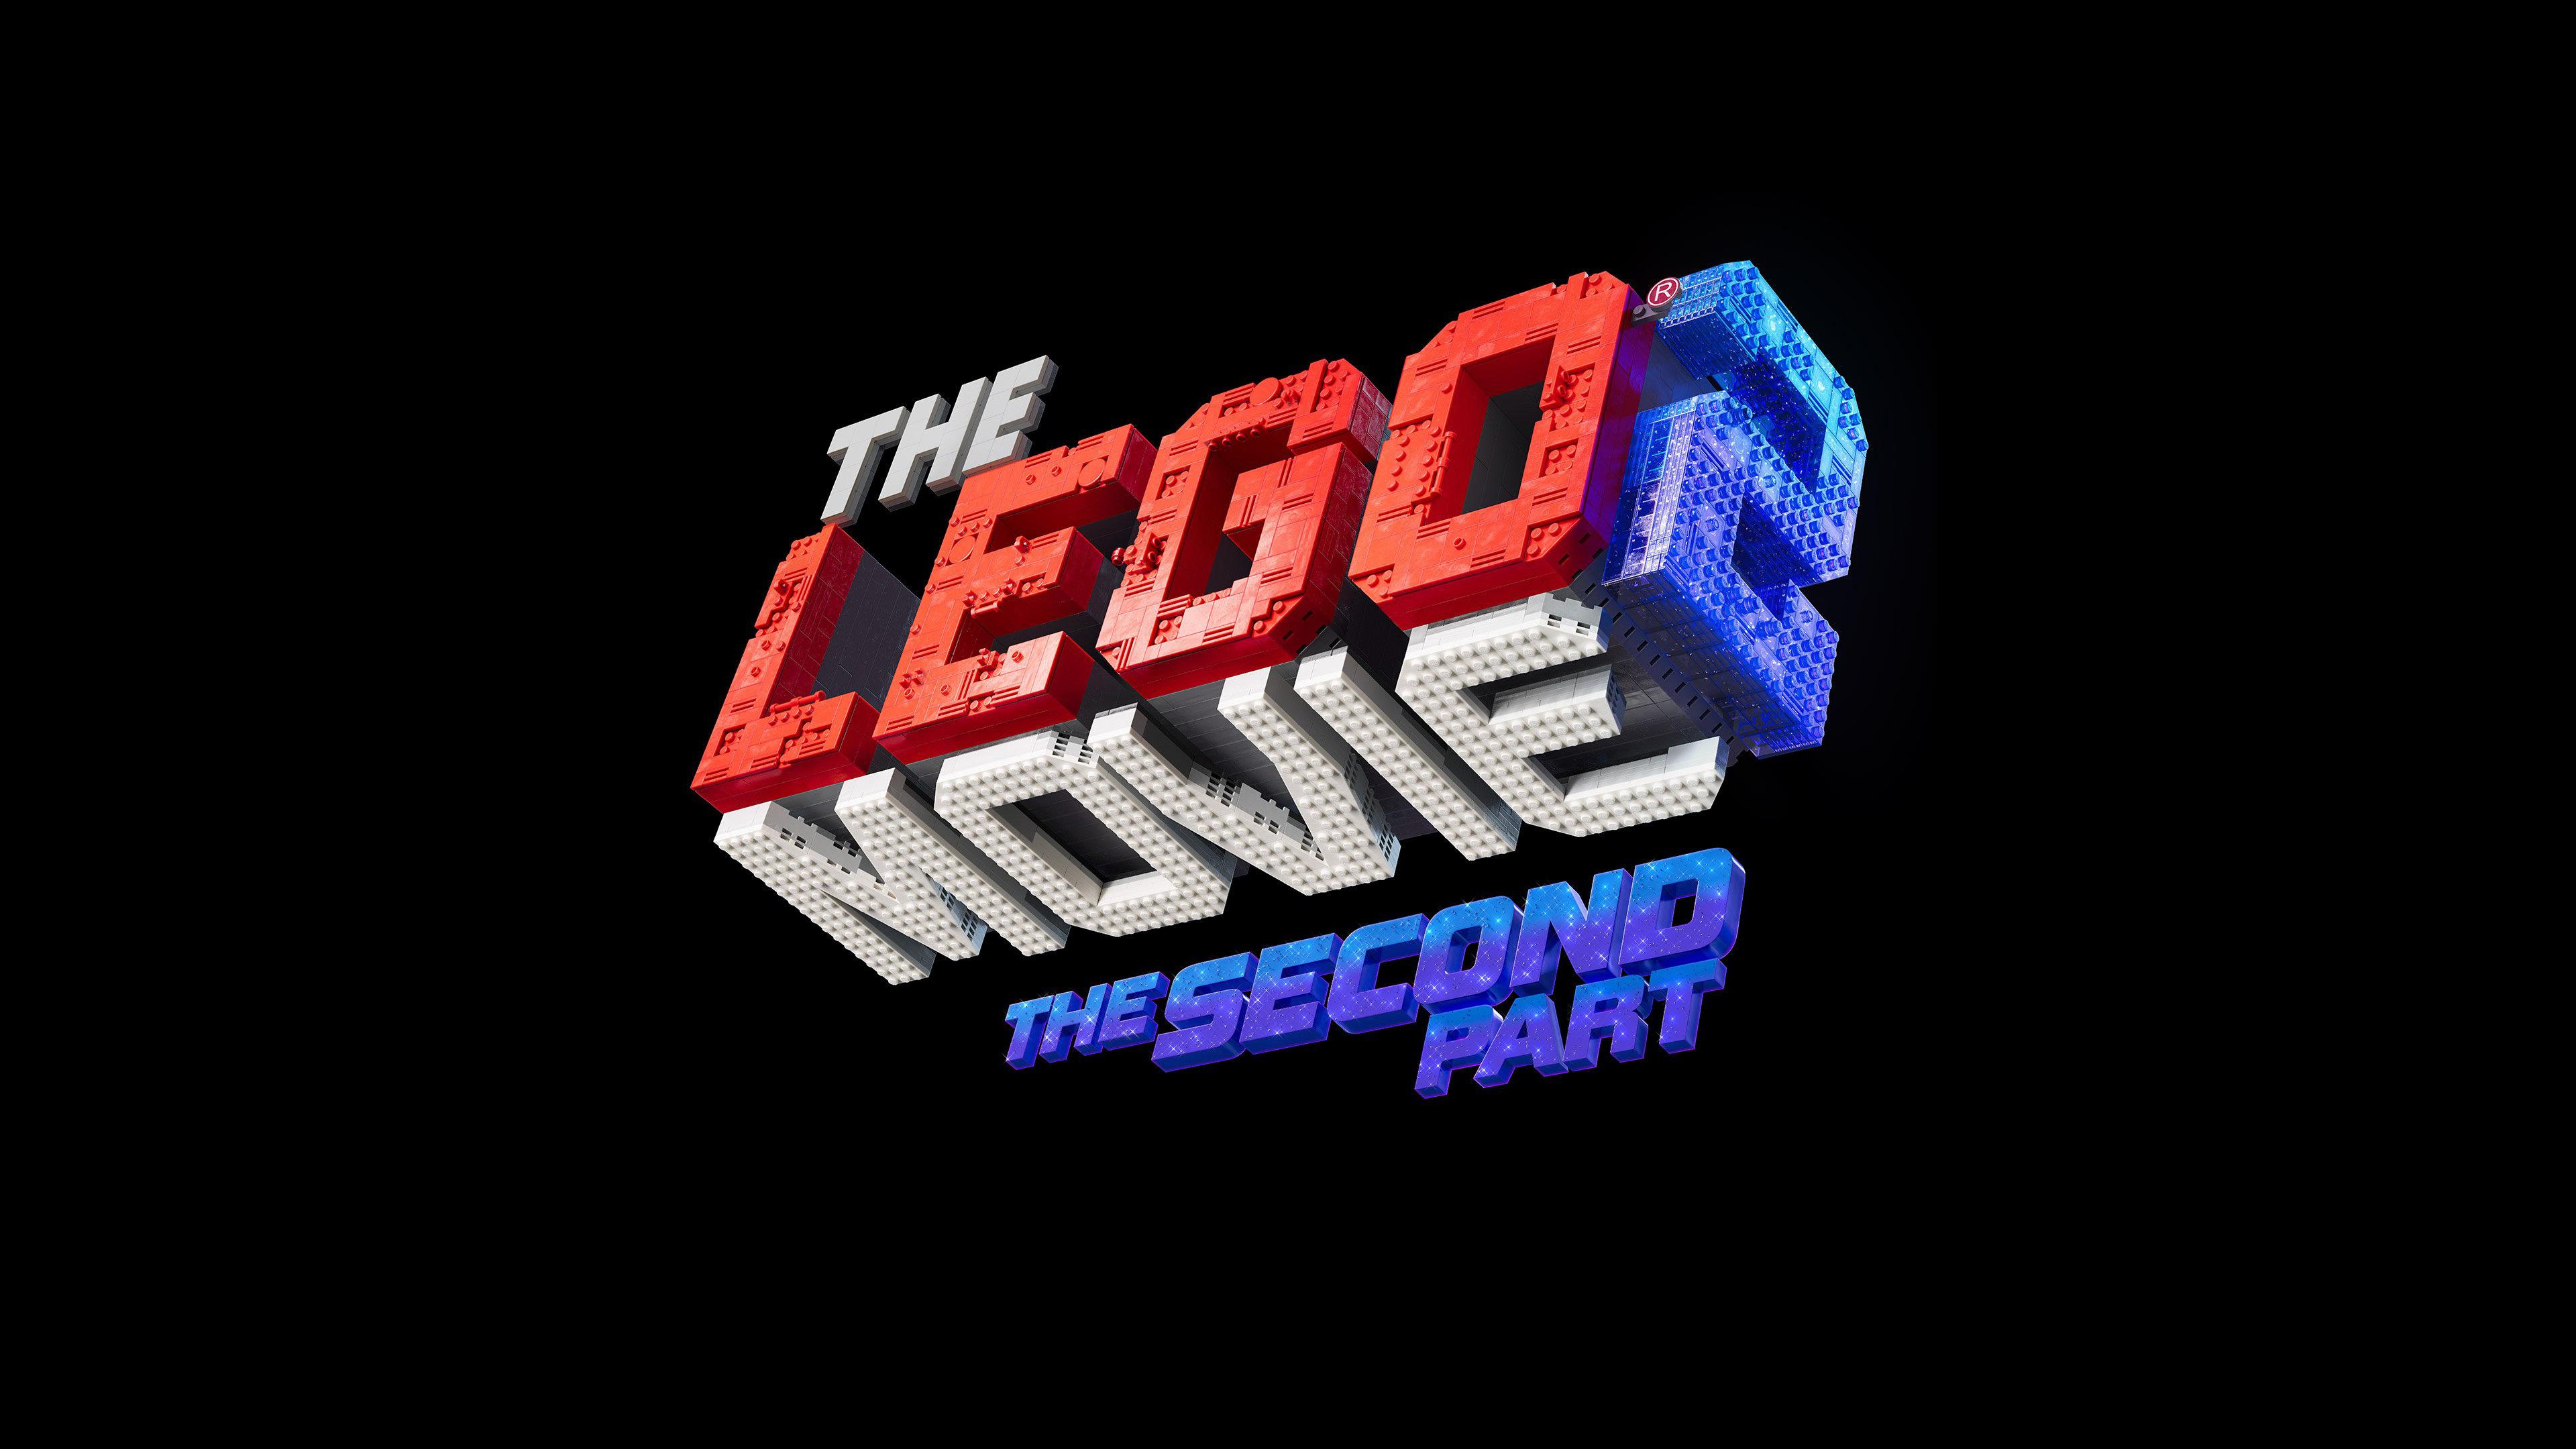 the lego movie 2 logo background wallpaper 66152